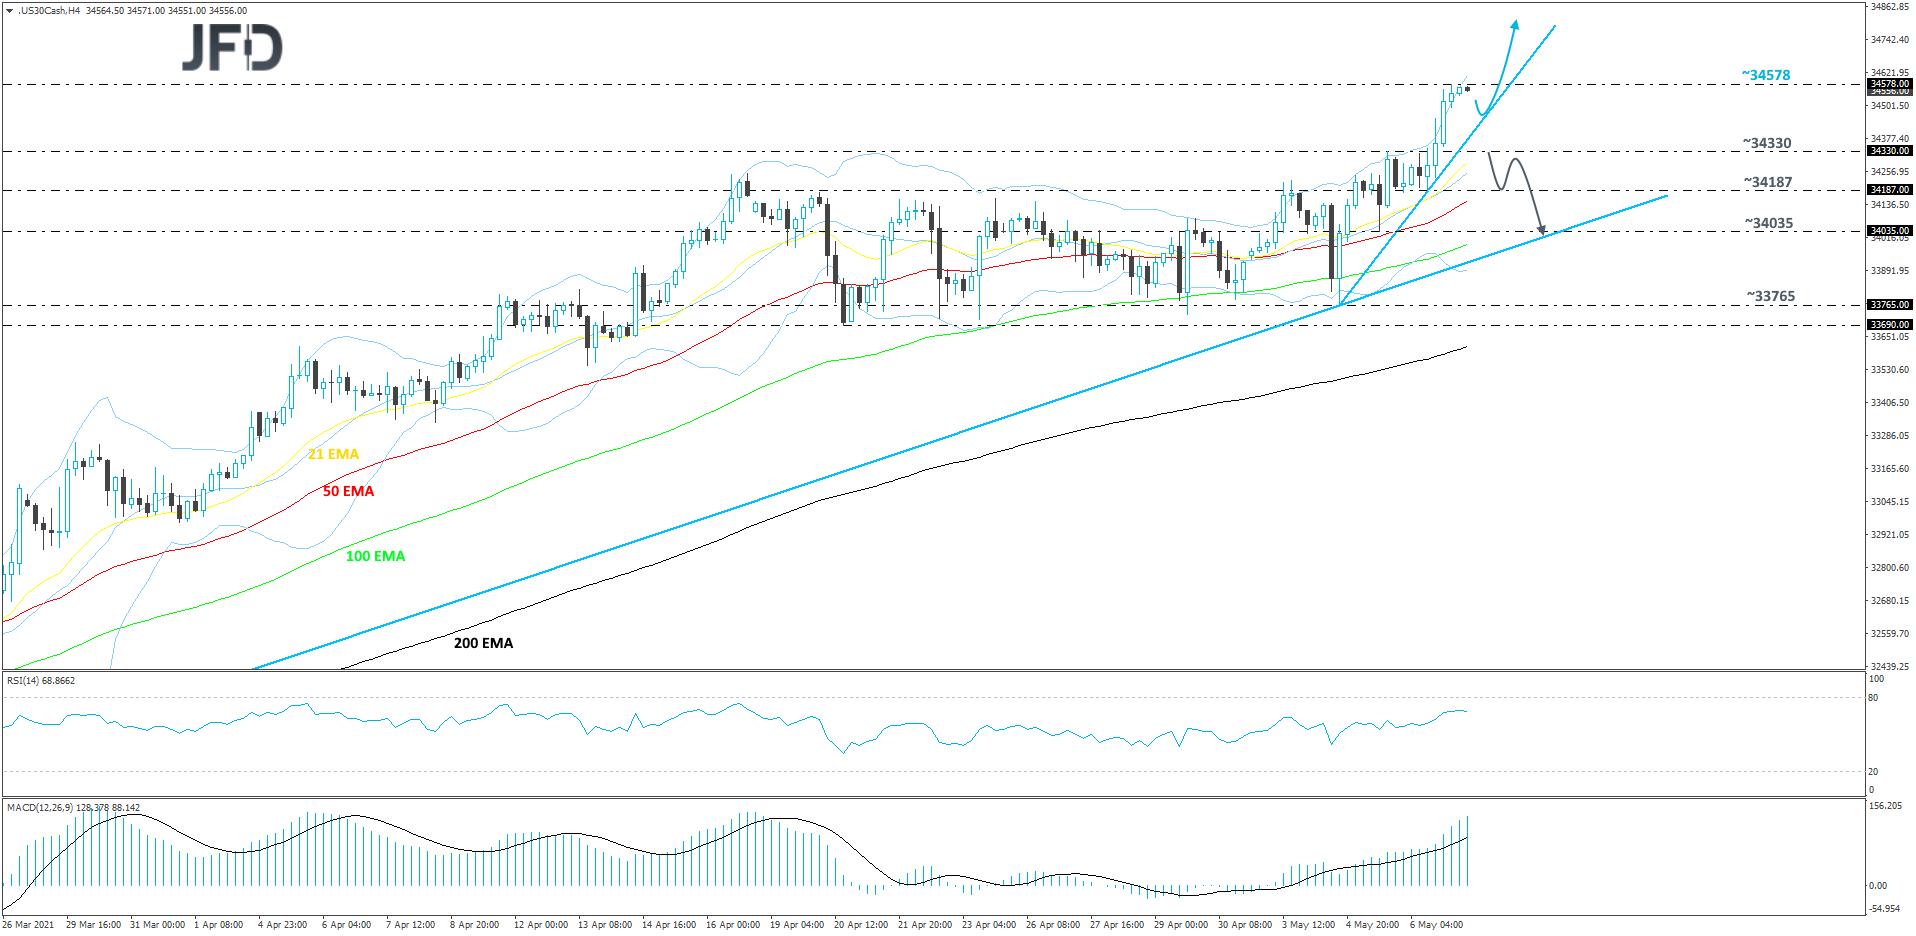 Dow Jones Industrial Average cash index 4-hour chart technical analysis